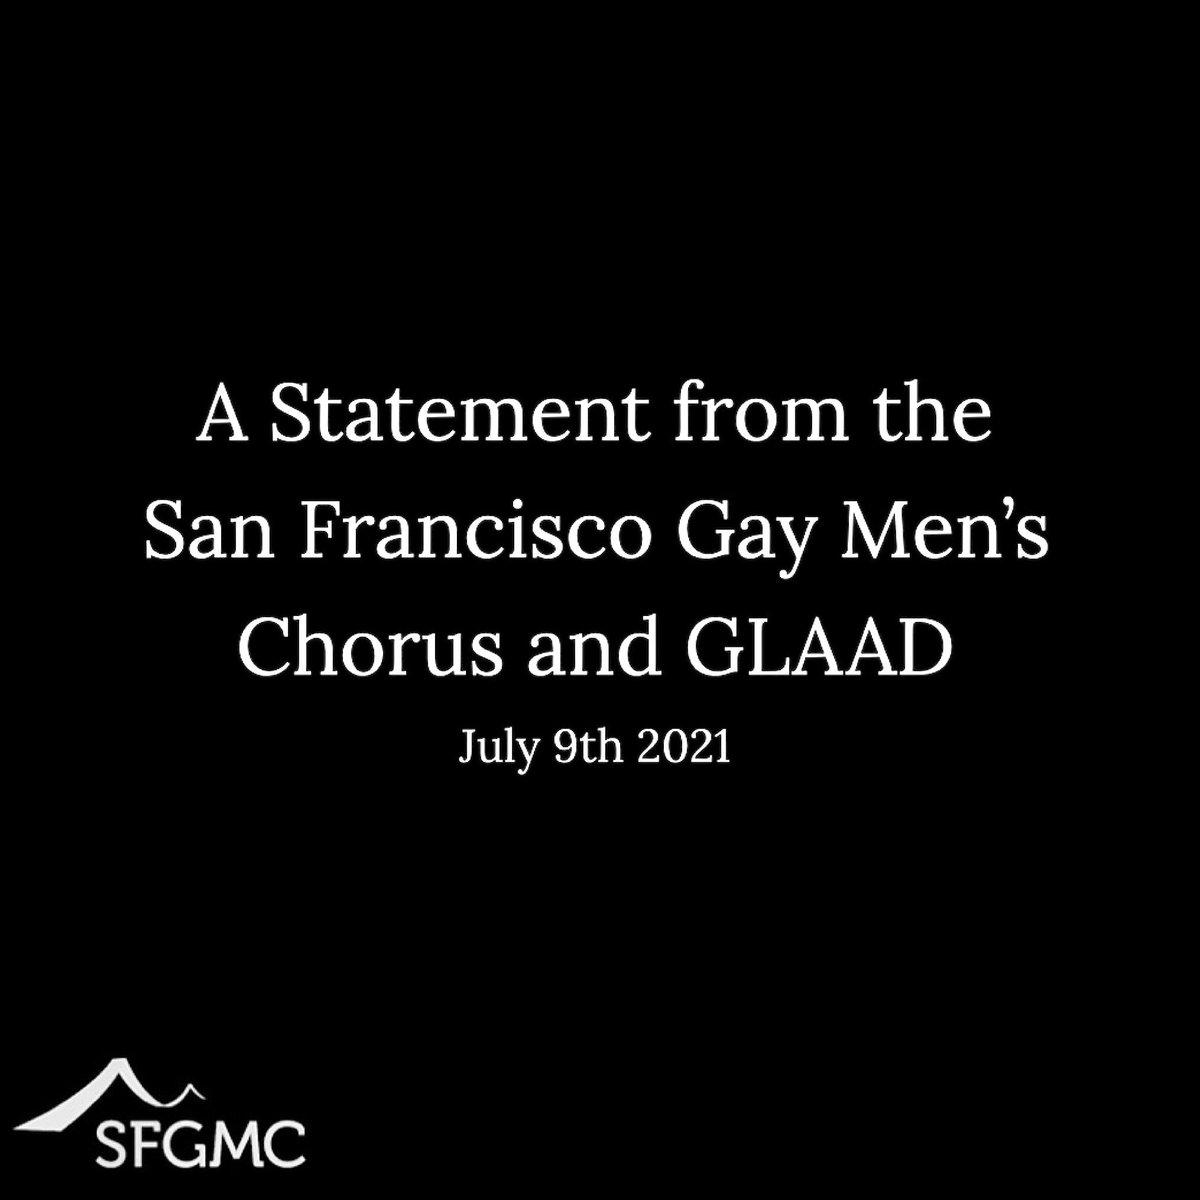 #ImFair @GLAAD https://t.co/VCZsbHfT4g